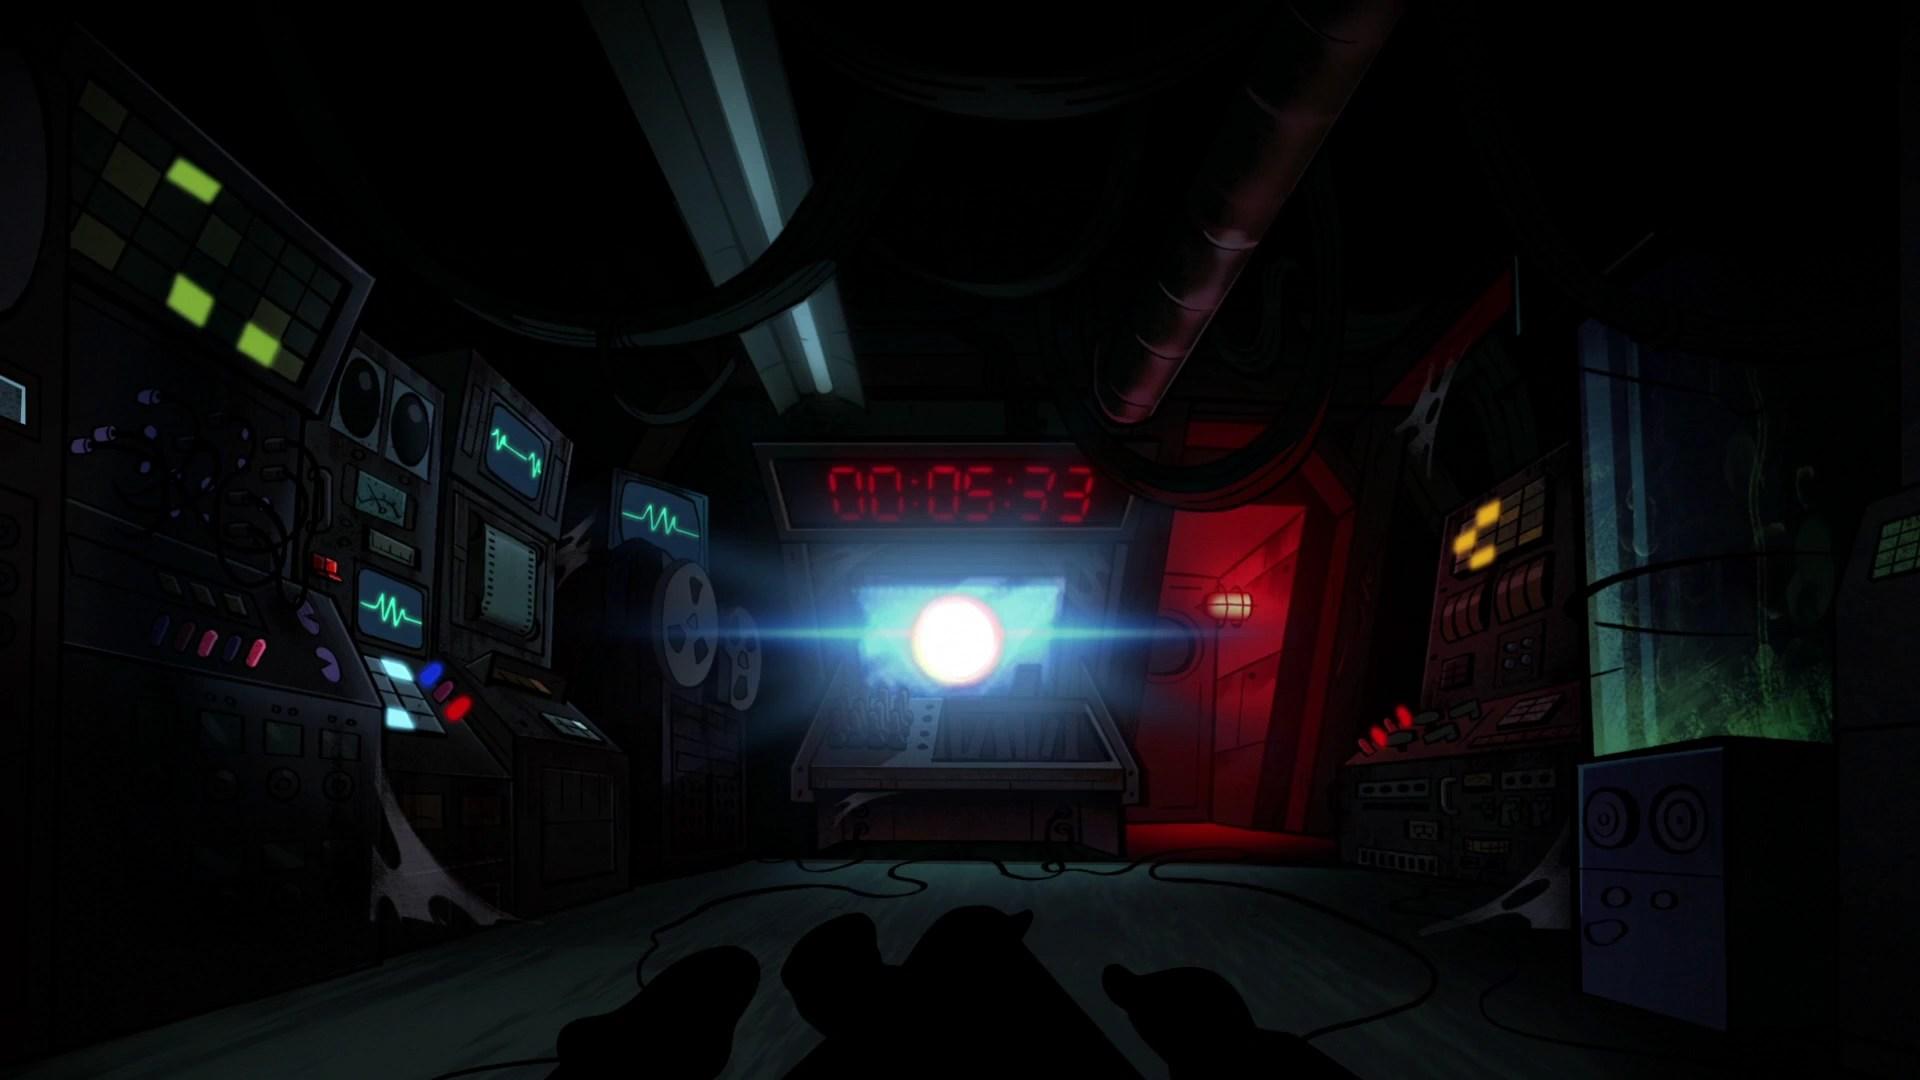 Gravity Falls Wallpaper Engine Underground Laboratory Disney Wiki Fandom Powered By Wikia